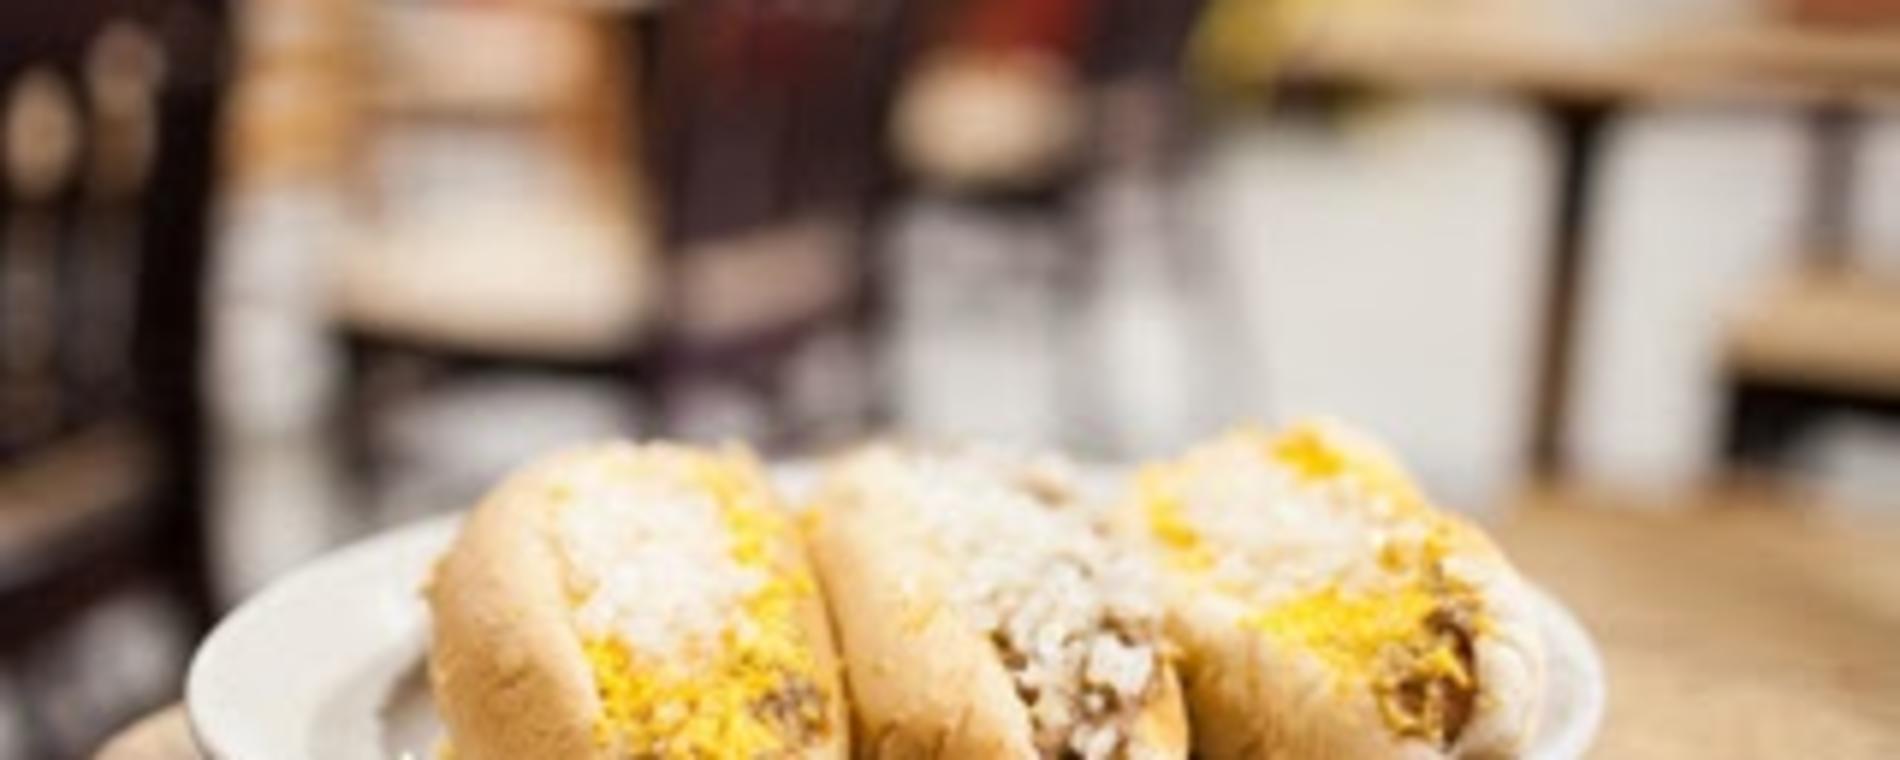 Coney Island 3 Hot Dogs Visit Wichita